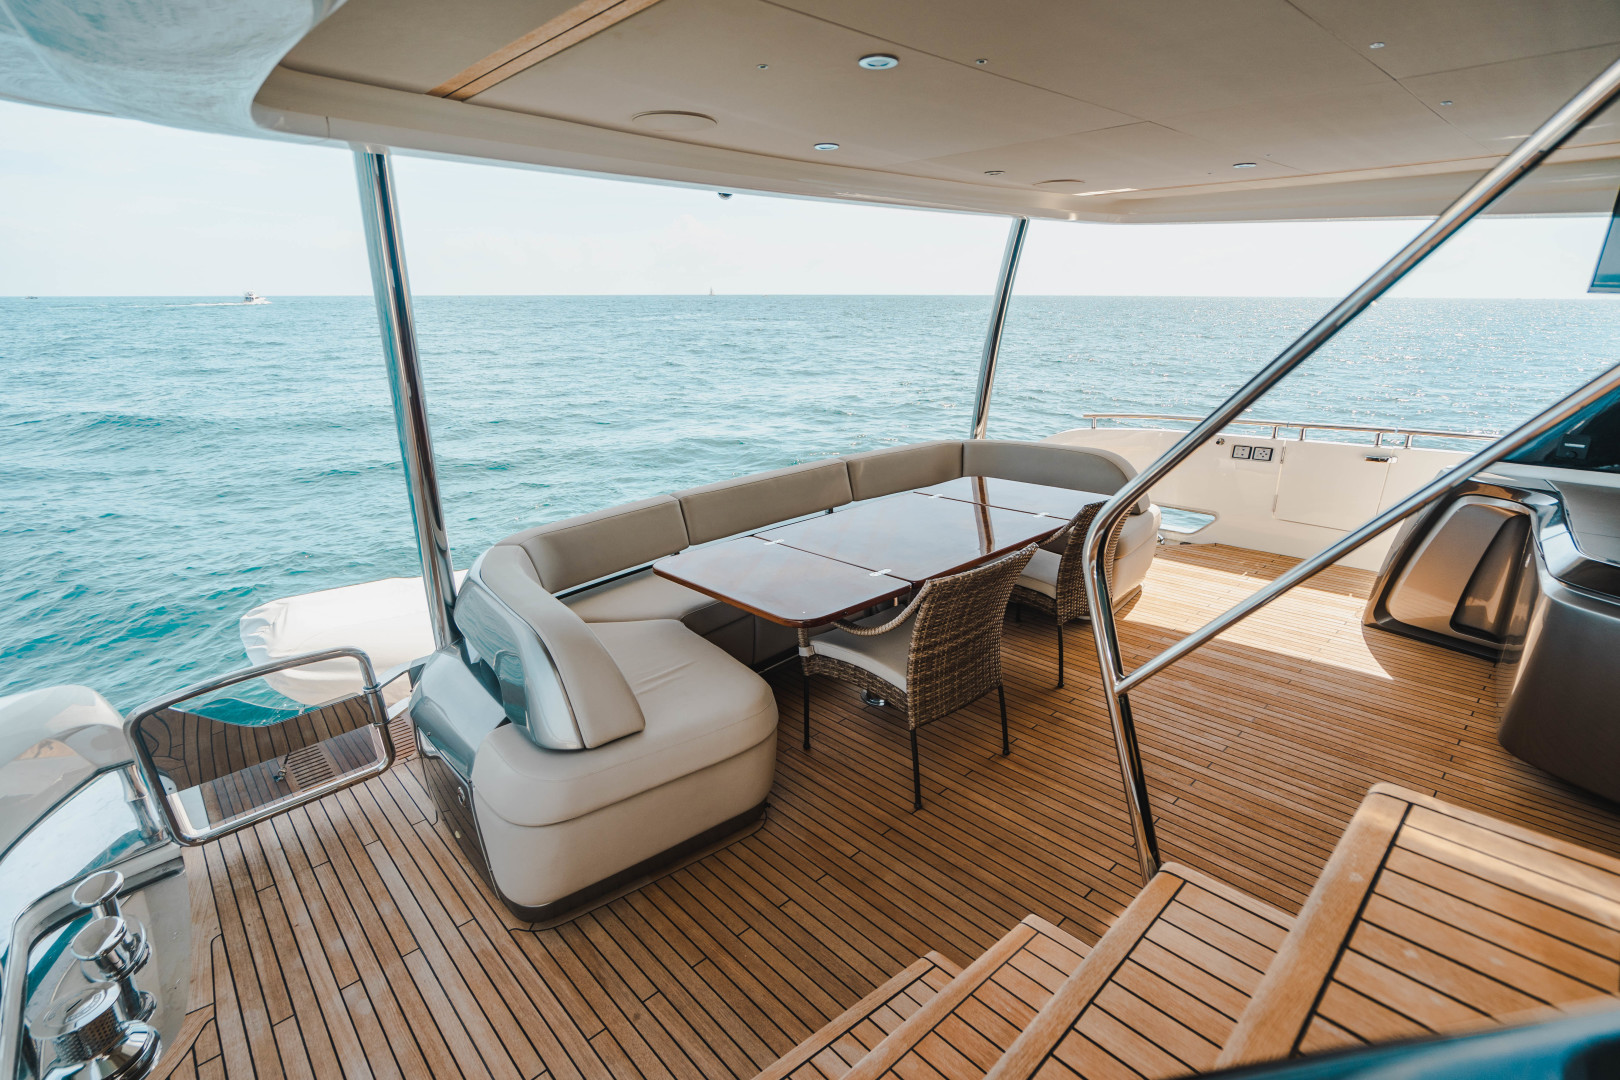 Princess-Y85  2019-Splash Delray Beach-Florida-United States-1631625 | Thumbnail